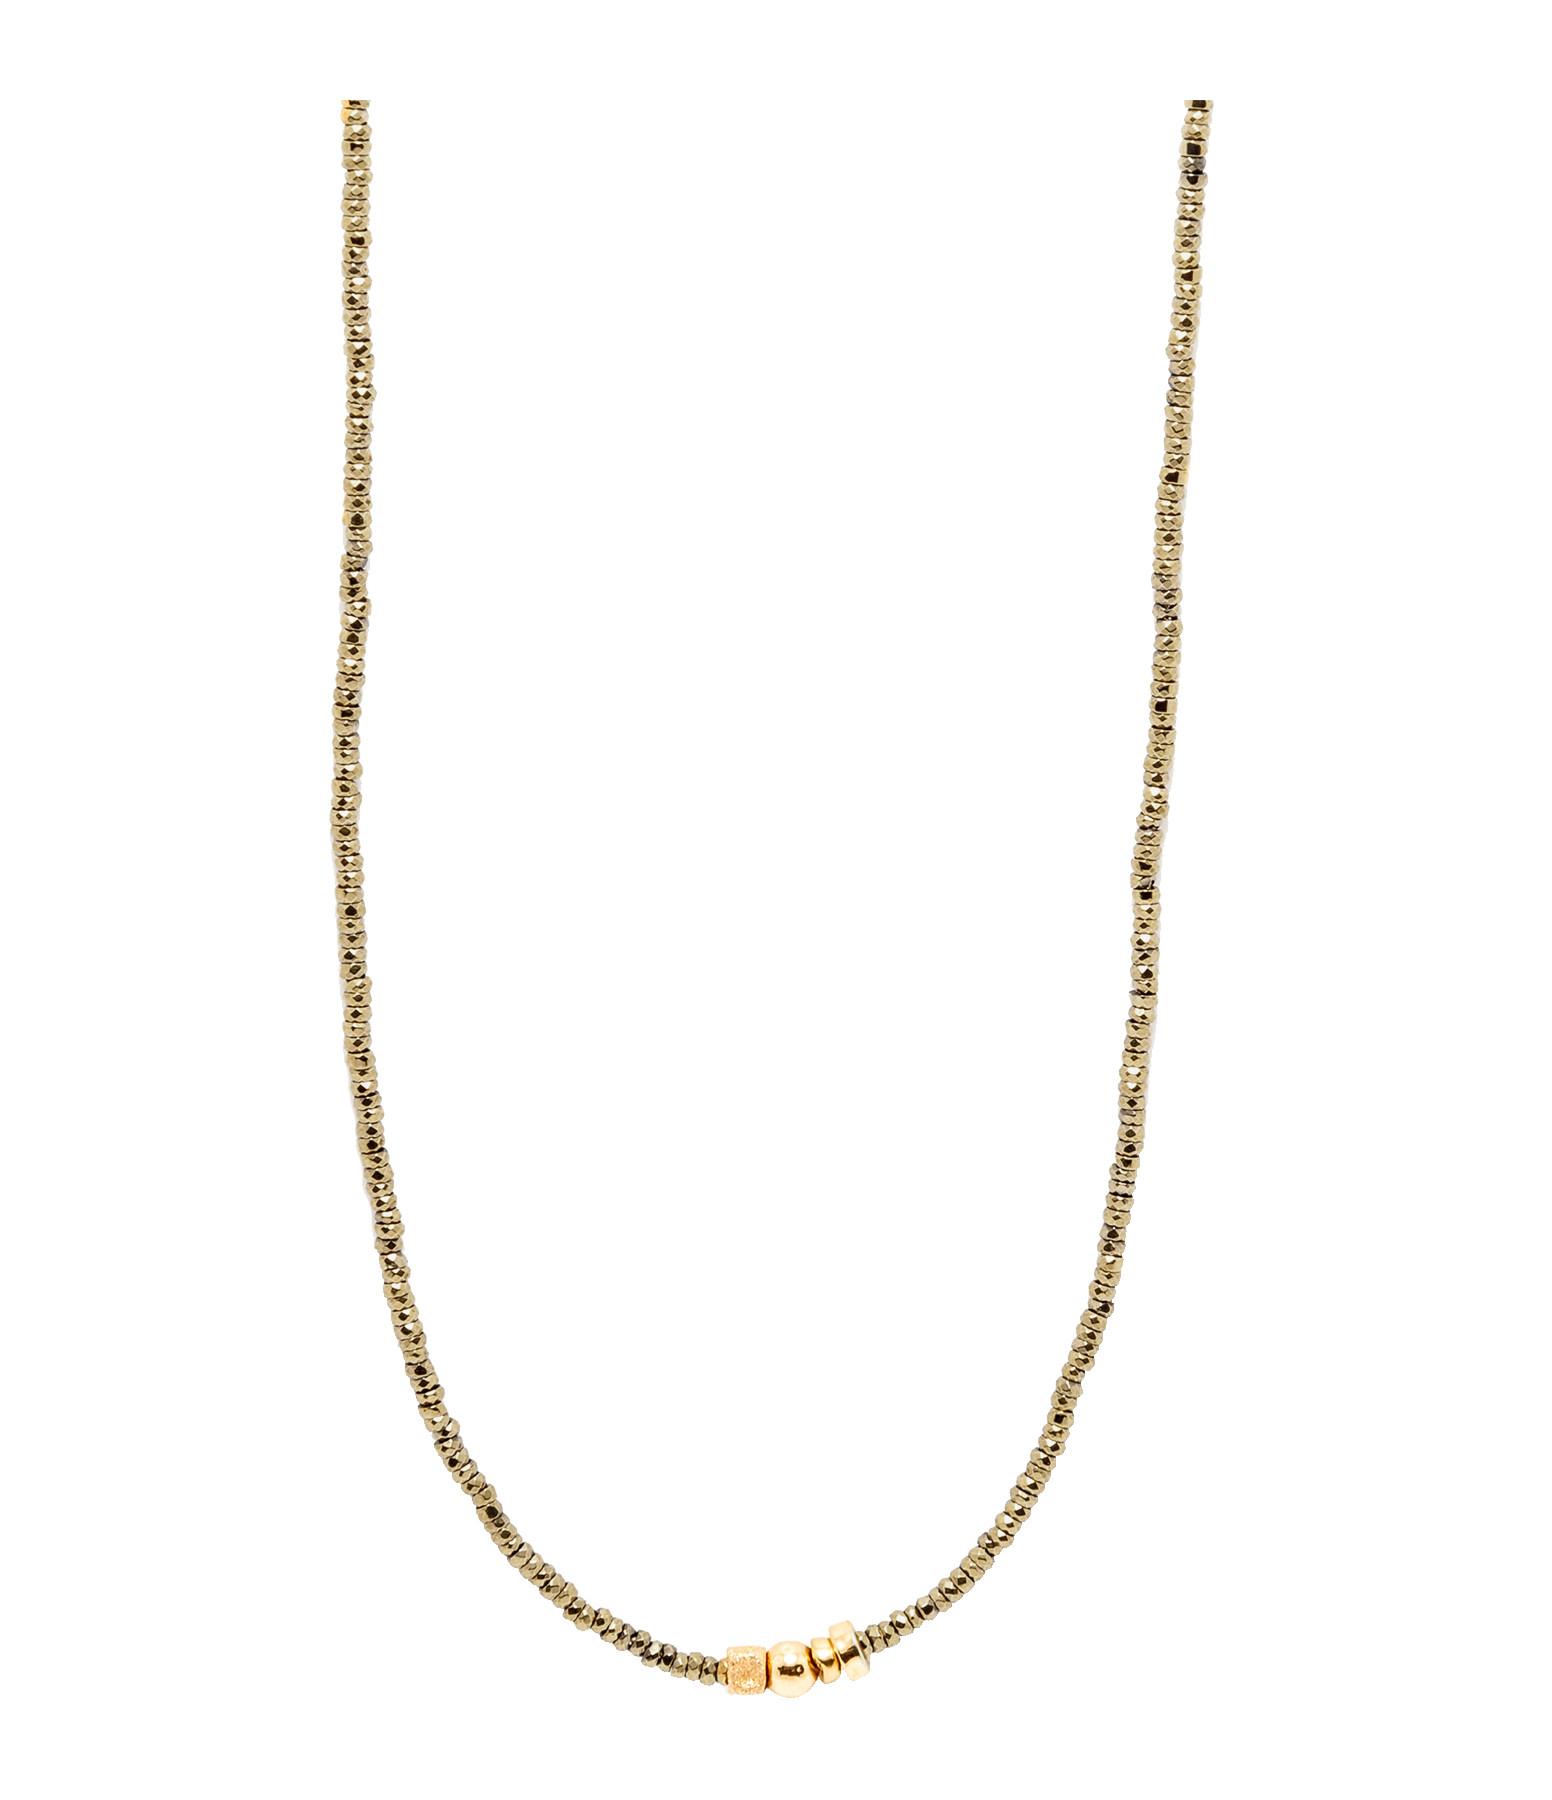 LSONGE - Collier Sublime 4 Perles Or Hématite Kaki